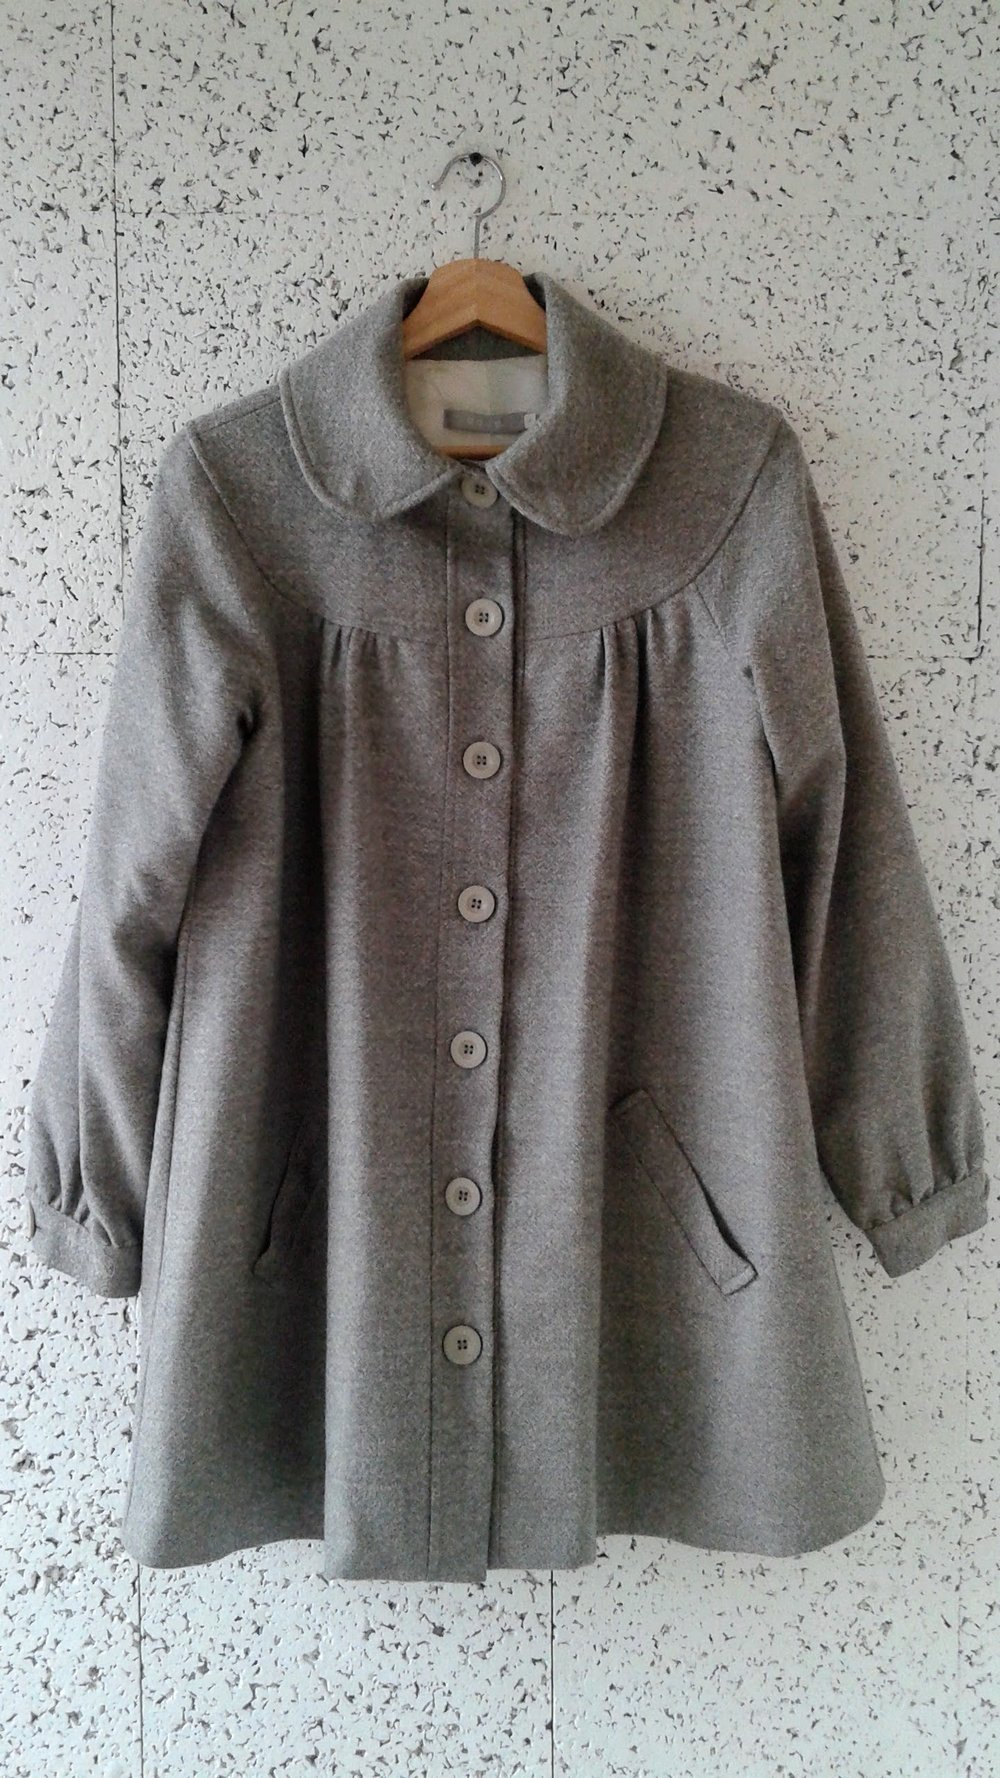 Dace coat; Size S, $48